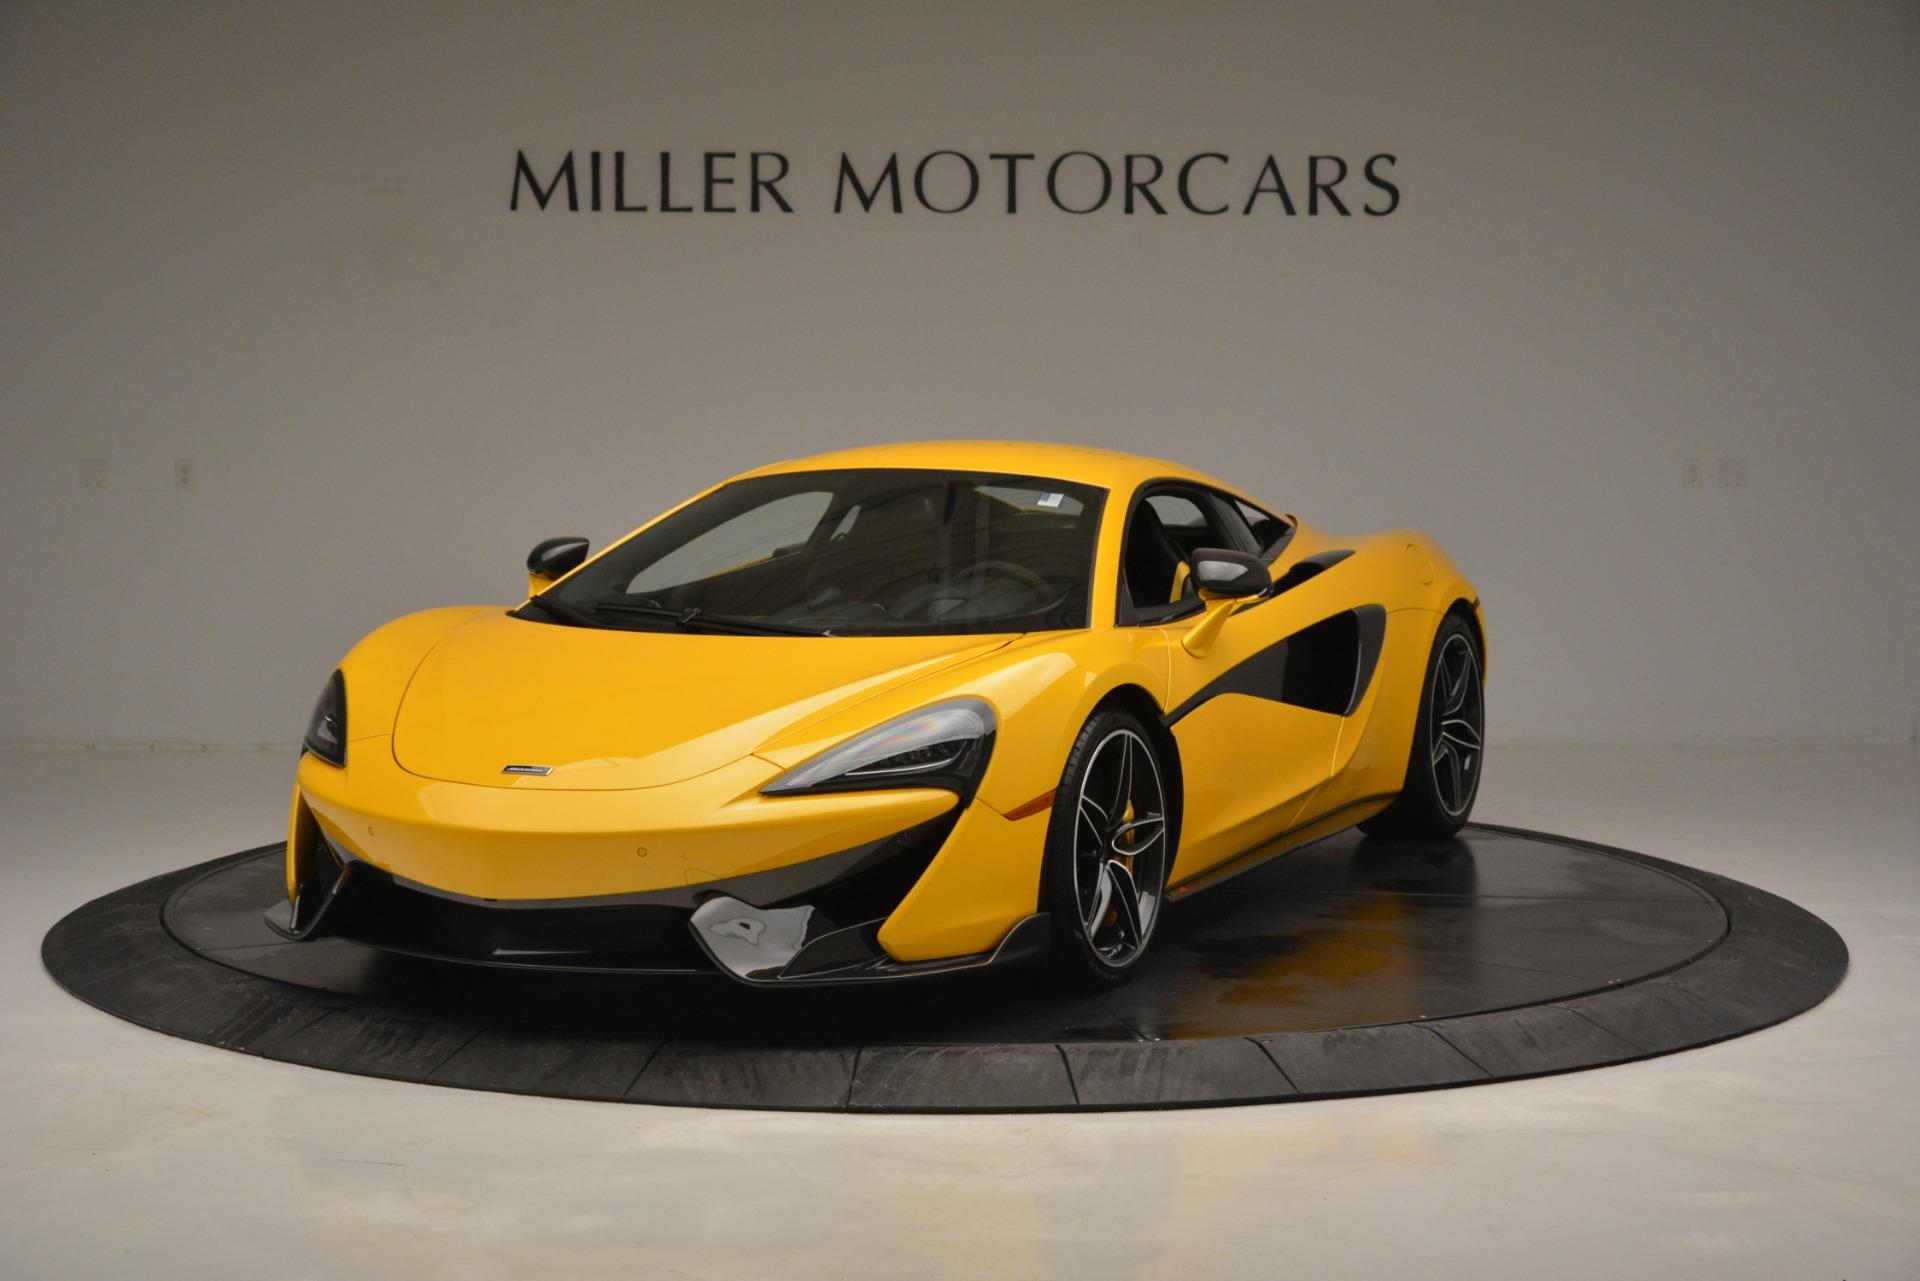 Used 2017 McLaren 570S for sale Sold at Alfa Romeo of Westport in Westport CT 06880 1